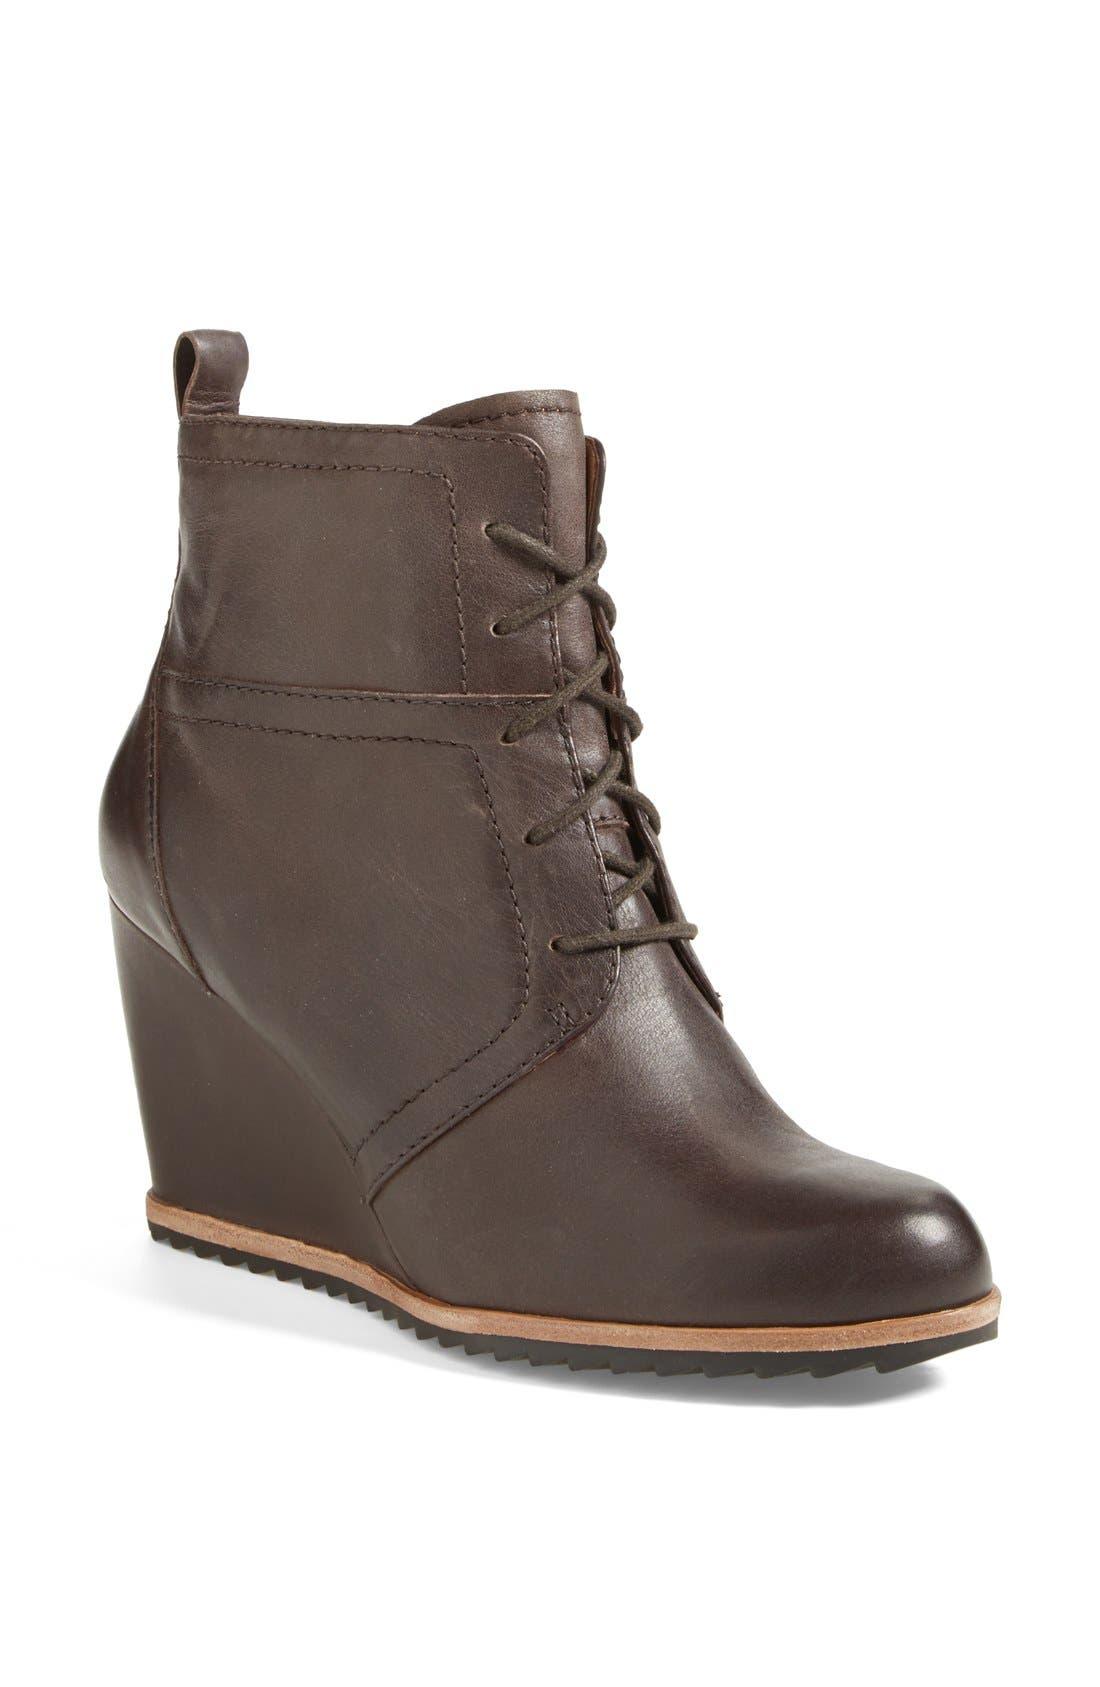 Main Image - Biala 'Alyssa' Lace-Up Wedge Boot (Women)